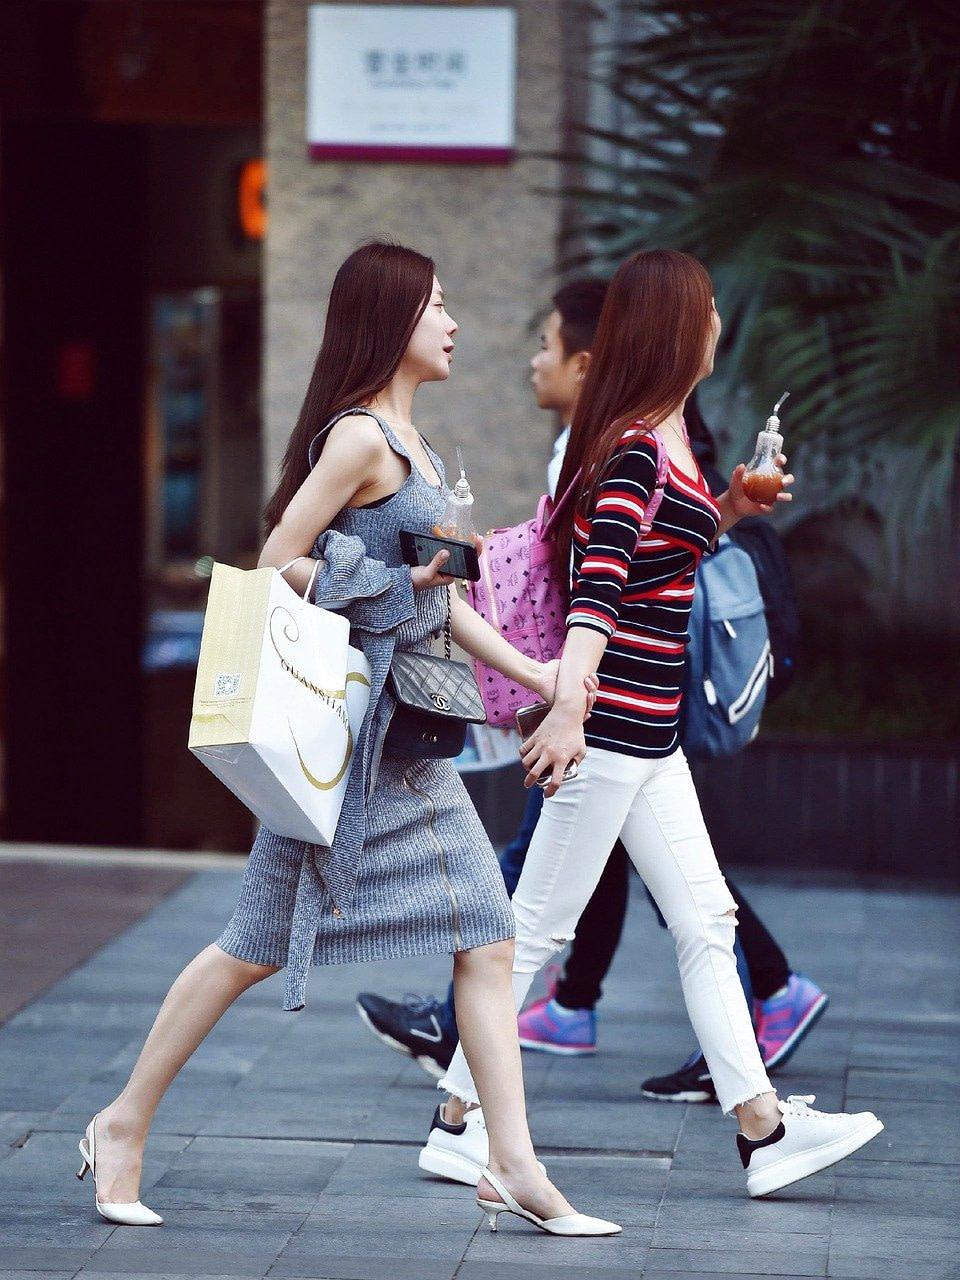 street photography, fashion girl, china